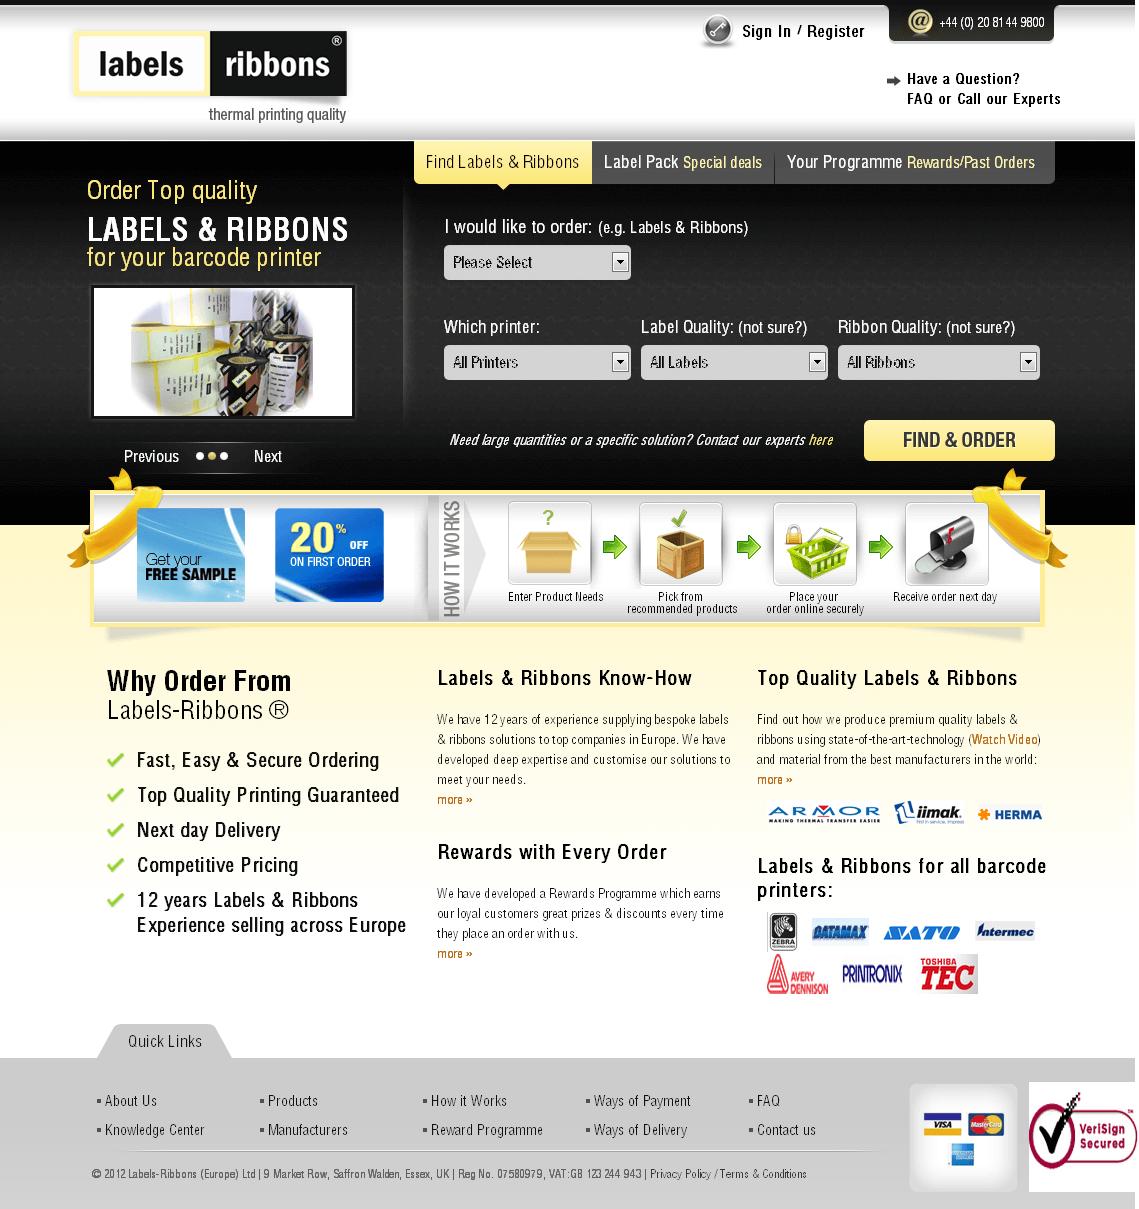 PHP Website 'labelsribbons' - Labels & Ribbons for Barcode Printer